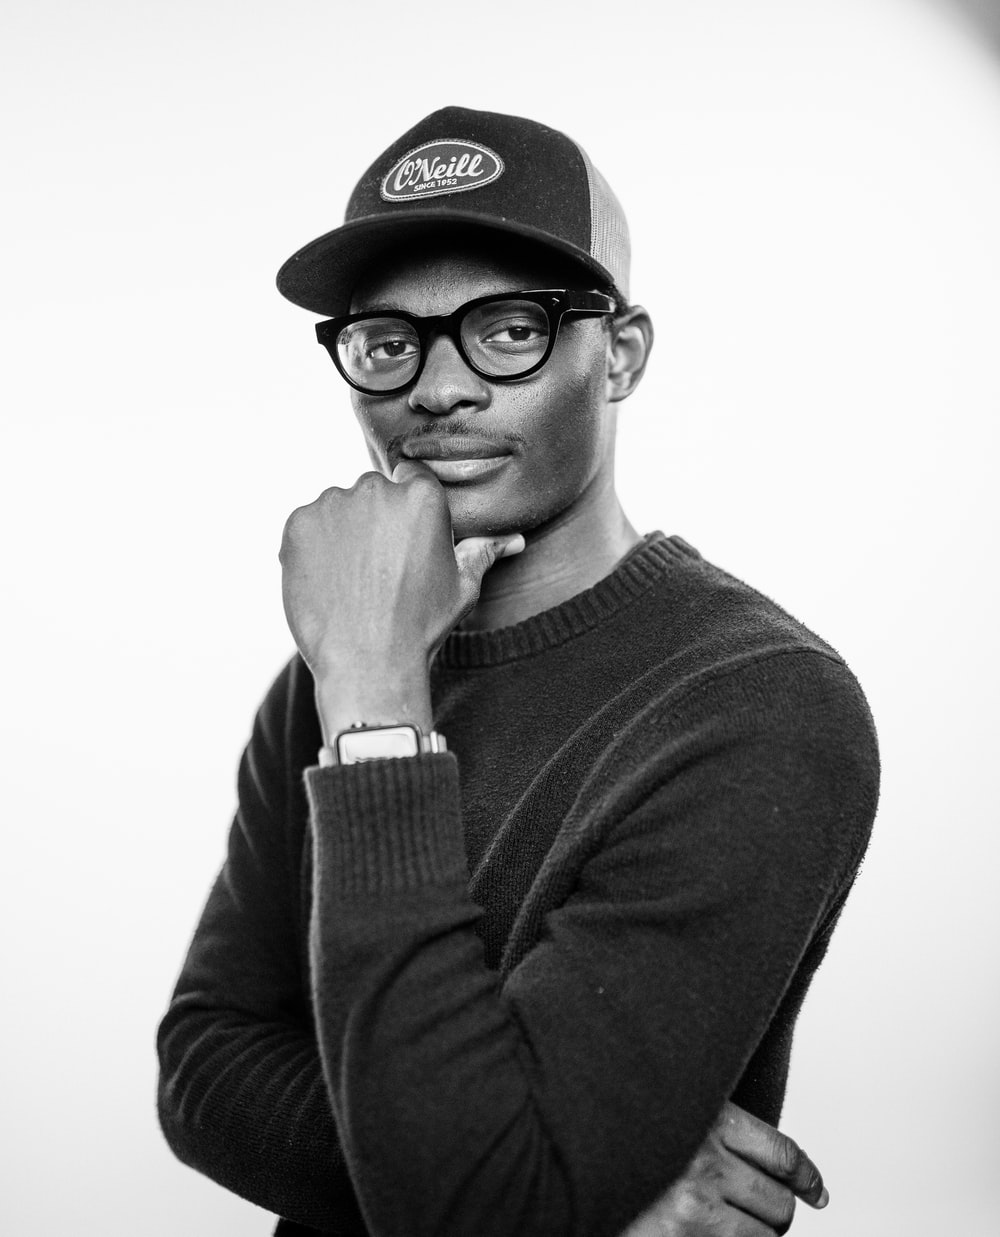 man in black sweater wearing black cap